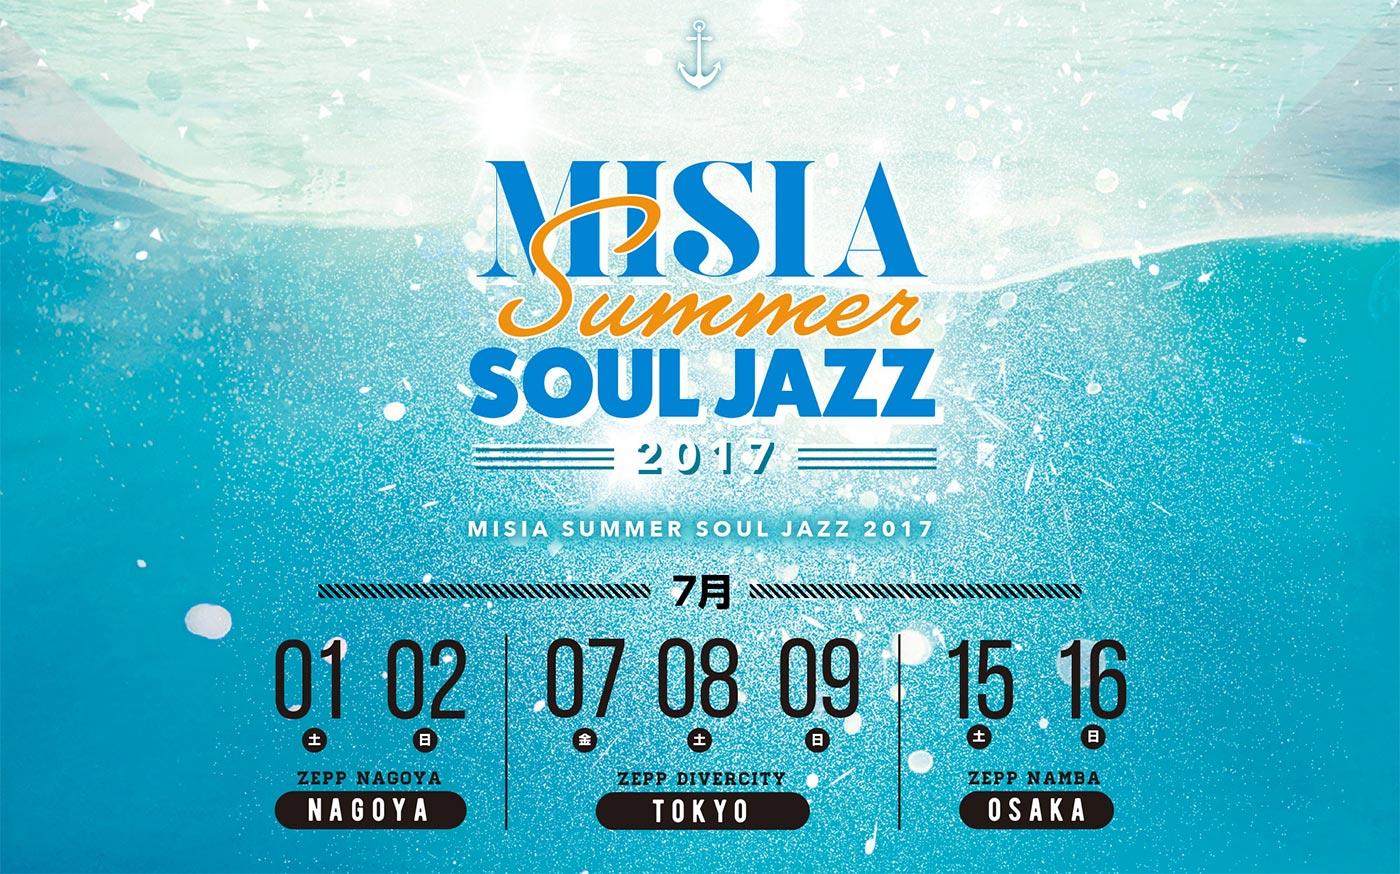 MISIA SUMMER SOUL JAZZ